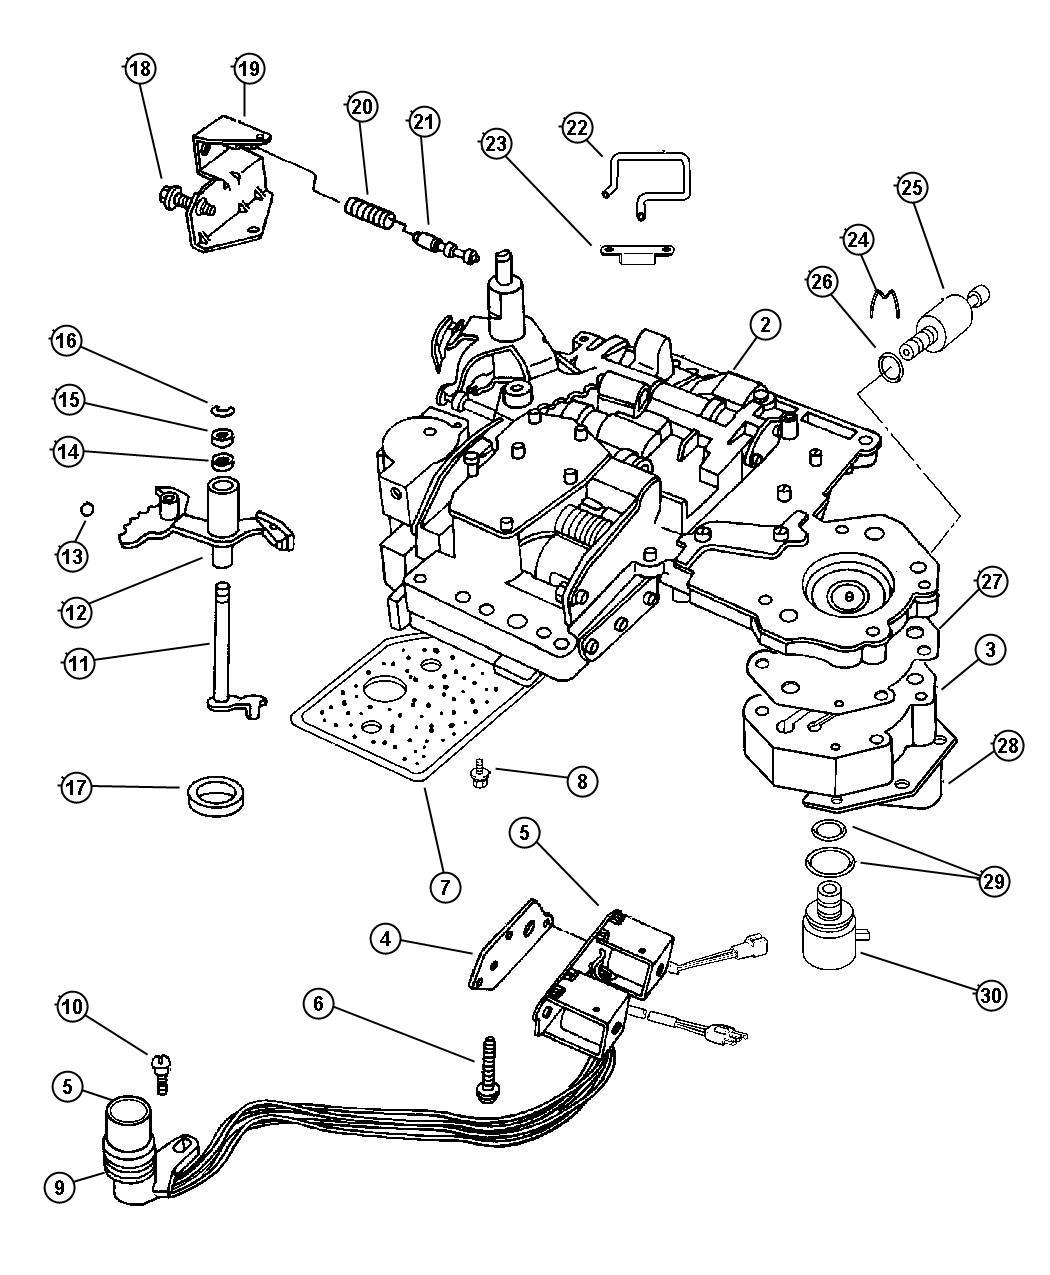 99 dodge dakota wiring diagram re 1805  99 dodge ram 1500 transmission wiring diagram 1999 dodge dakota stereo wiring diagram dodge ram 1500 transmission wiring diagram